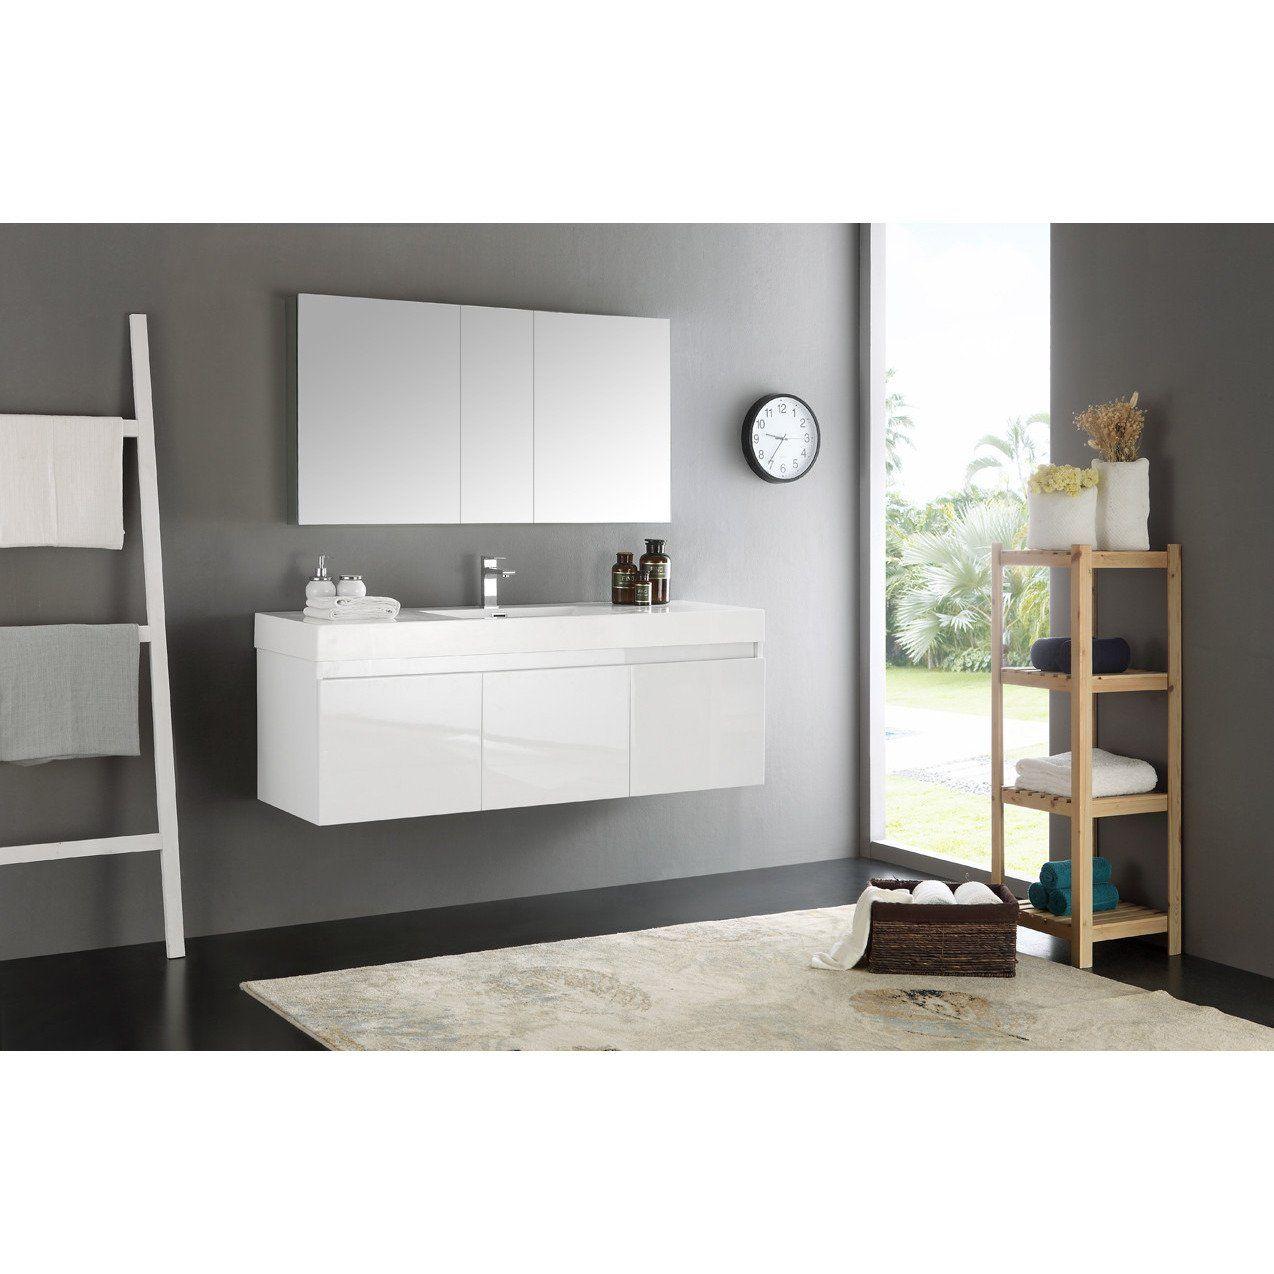 Fresca Mezzo 60 Modern Bathroom